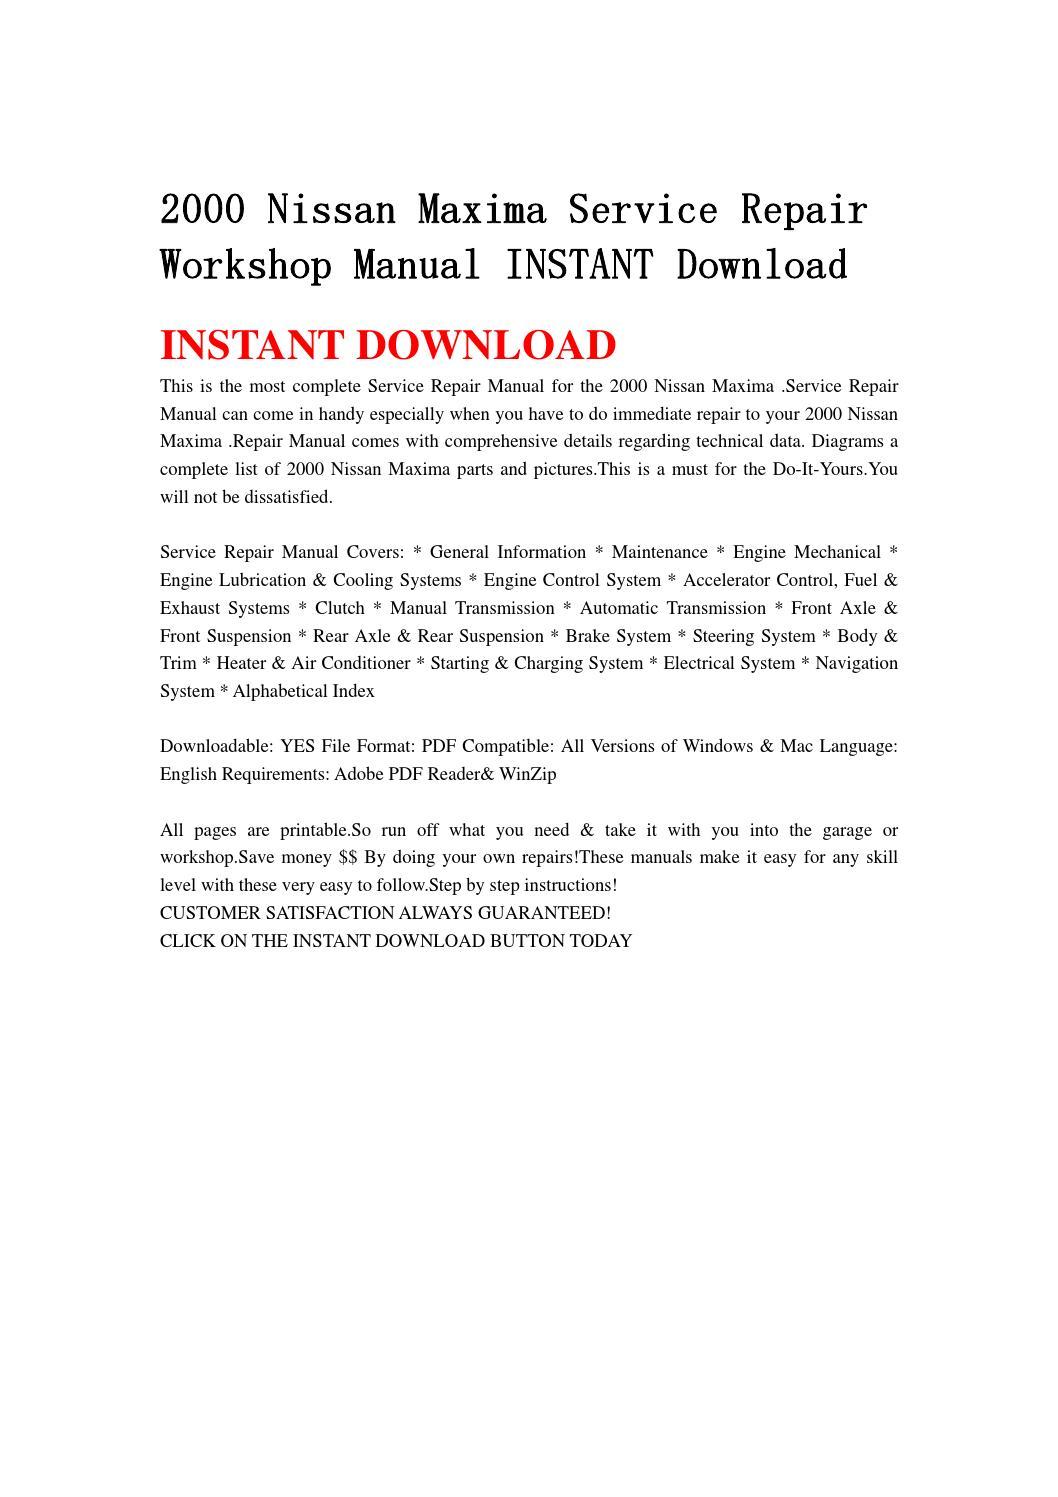 2000 nissan maxima service repair workshop manual instant download by  ysgebf - issuu